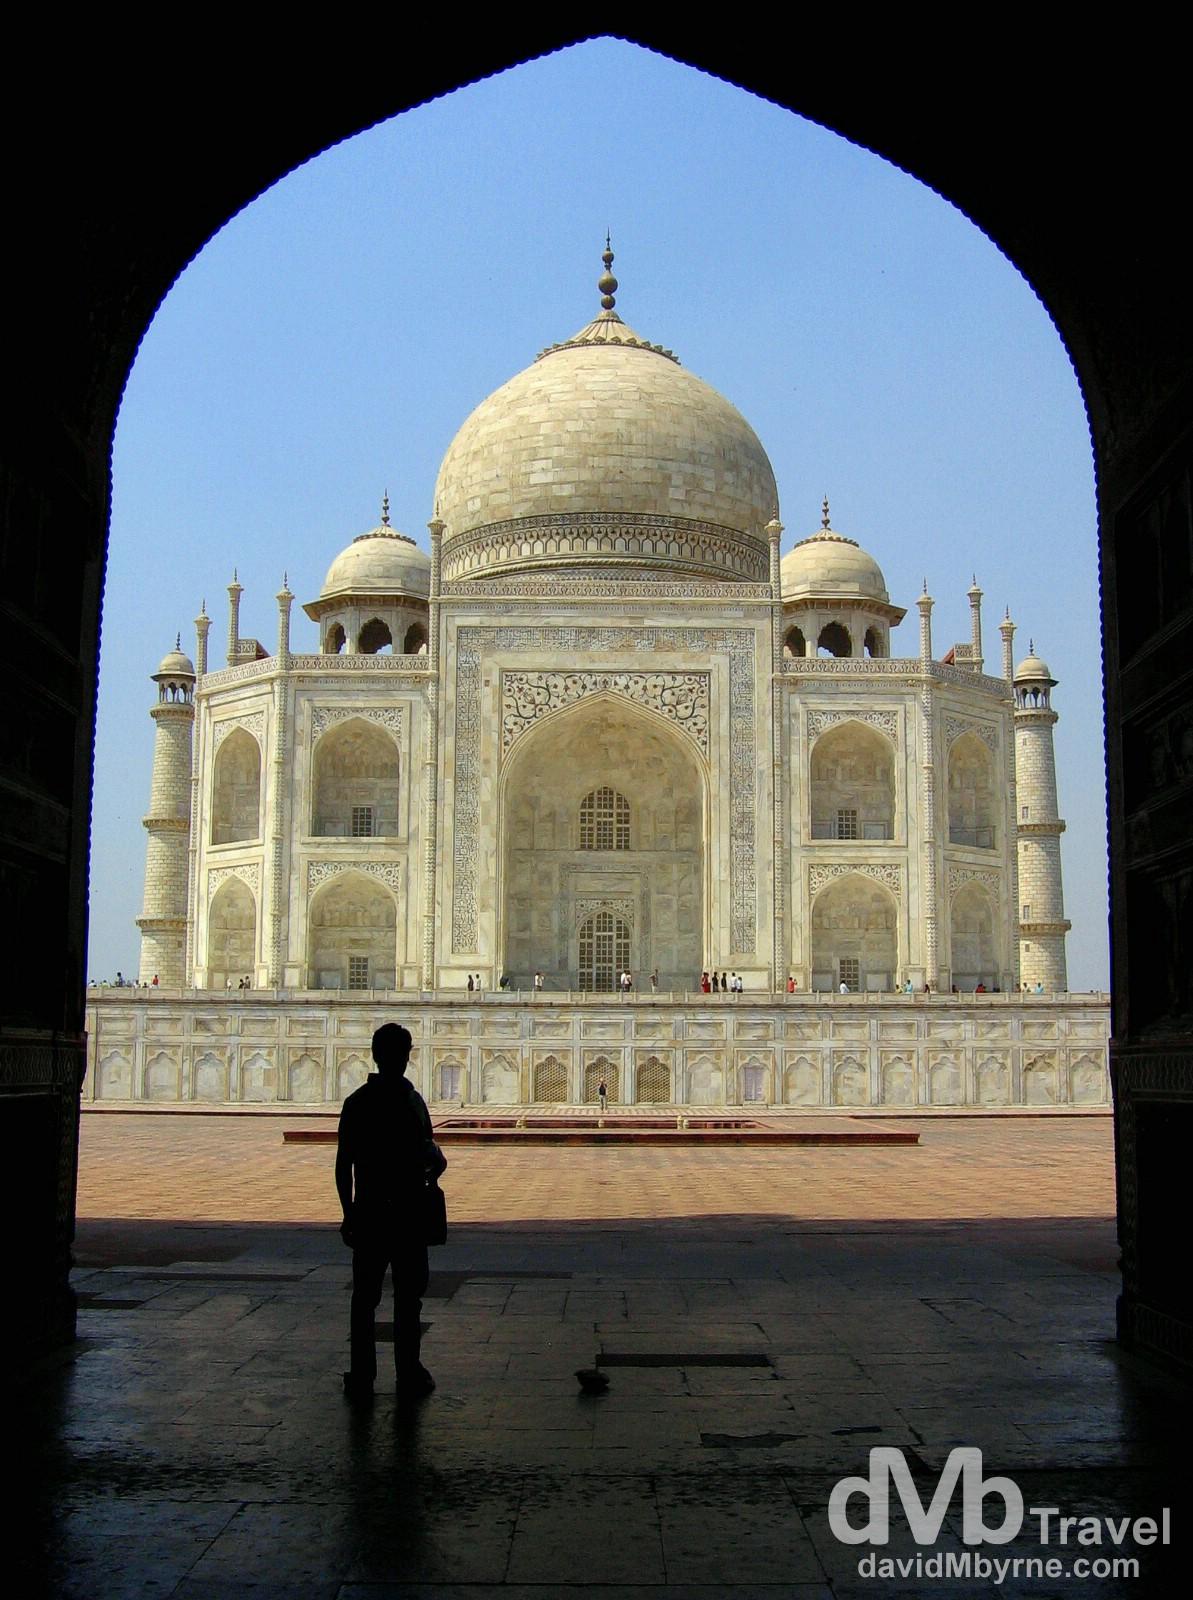 The Taj Mahal, Agra, Uttar Pradesh, India. March 25, 2008.